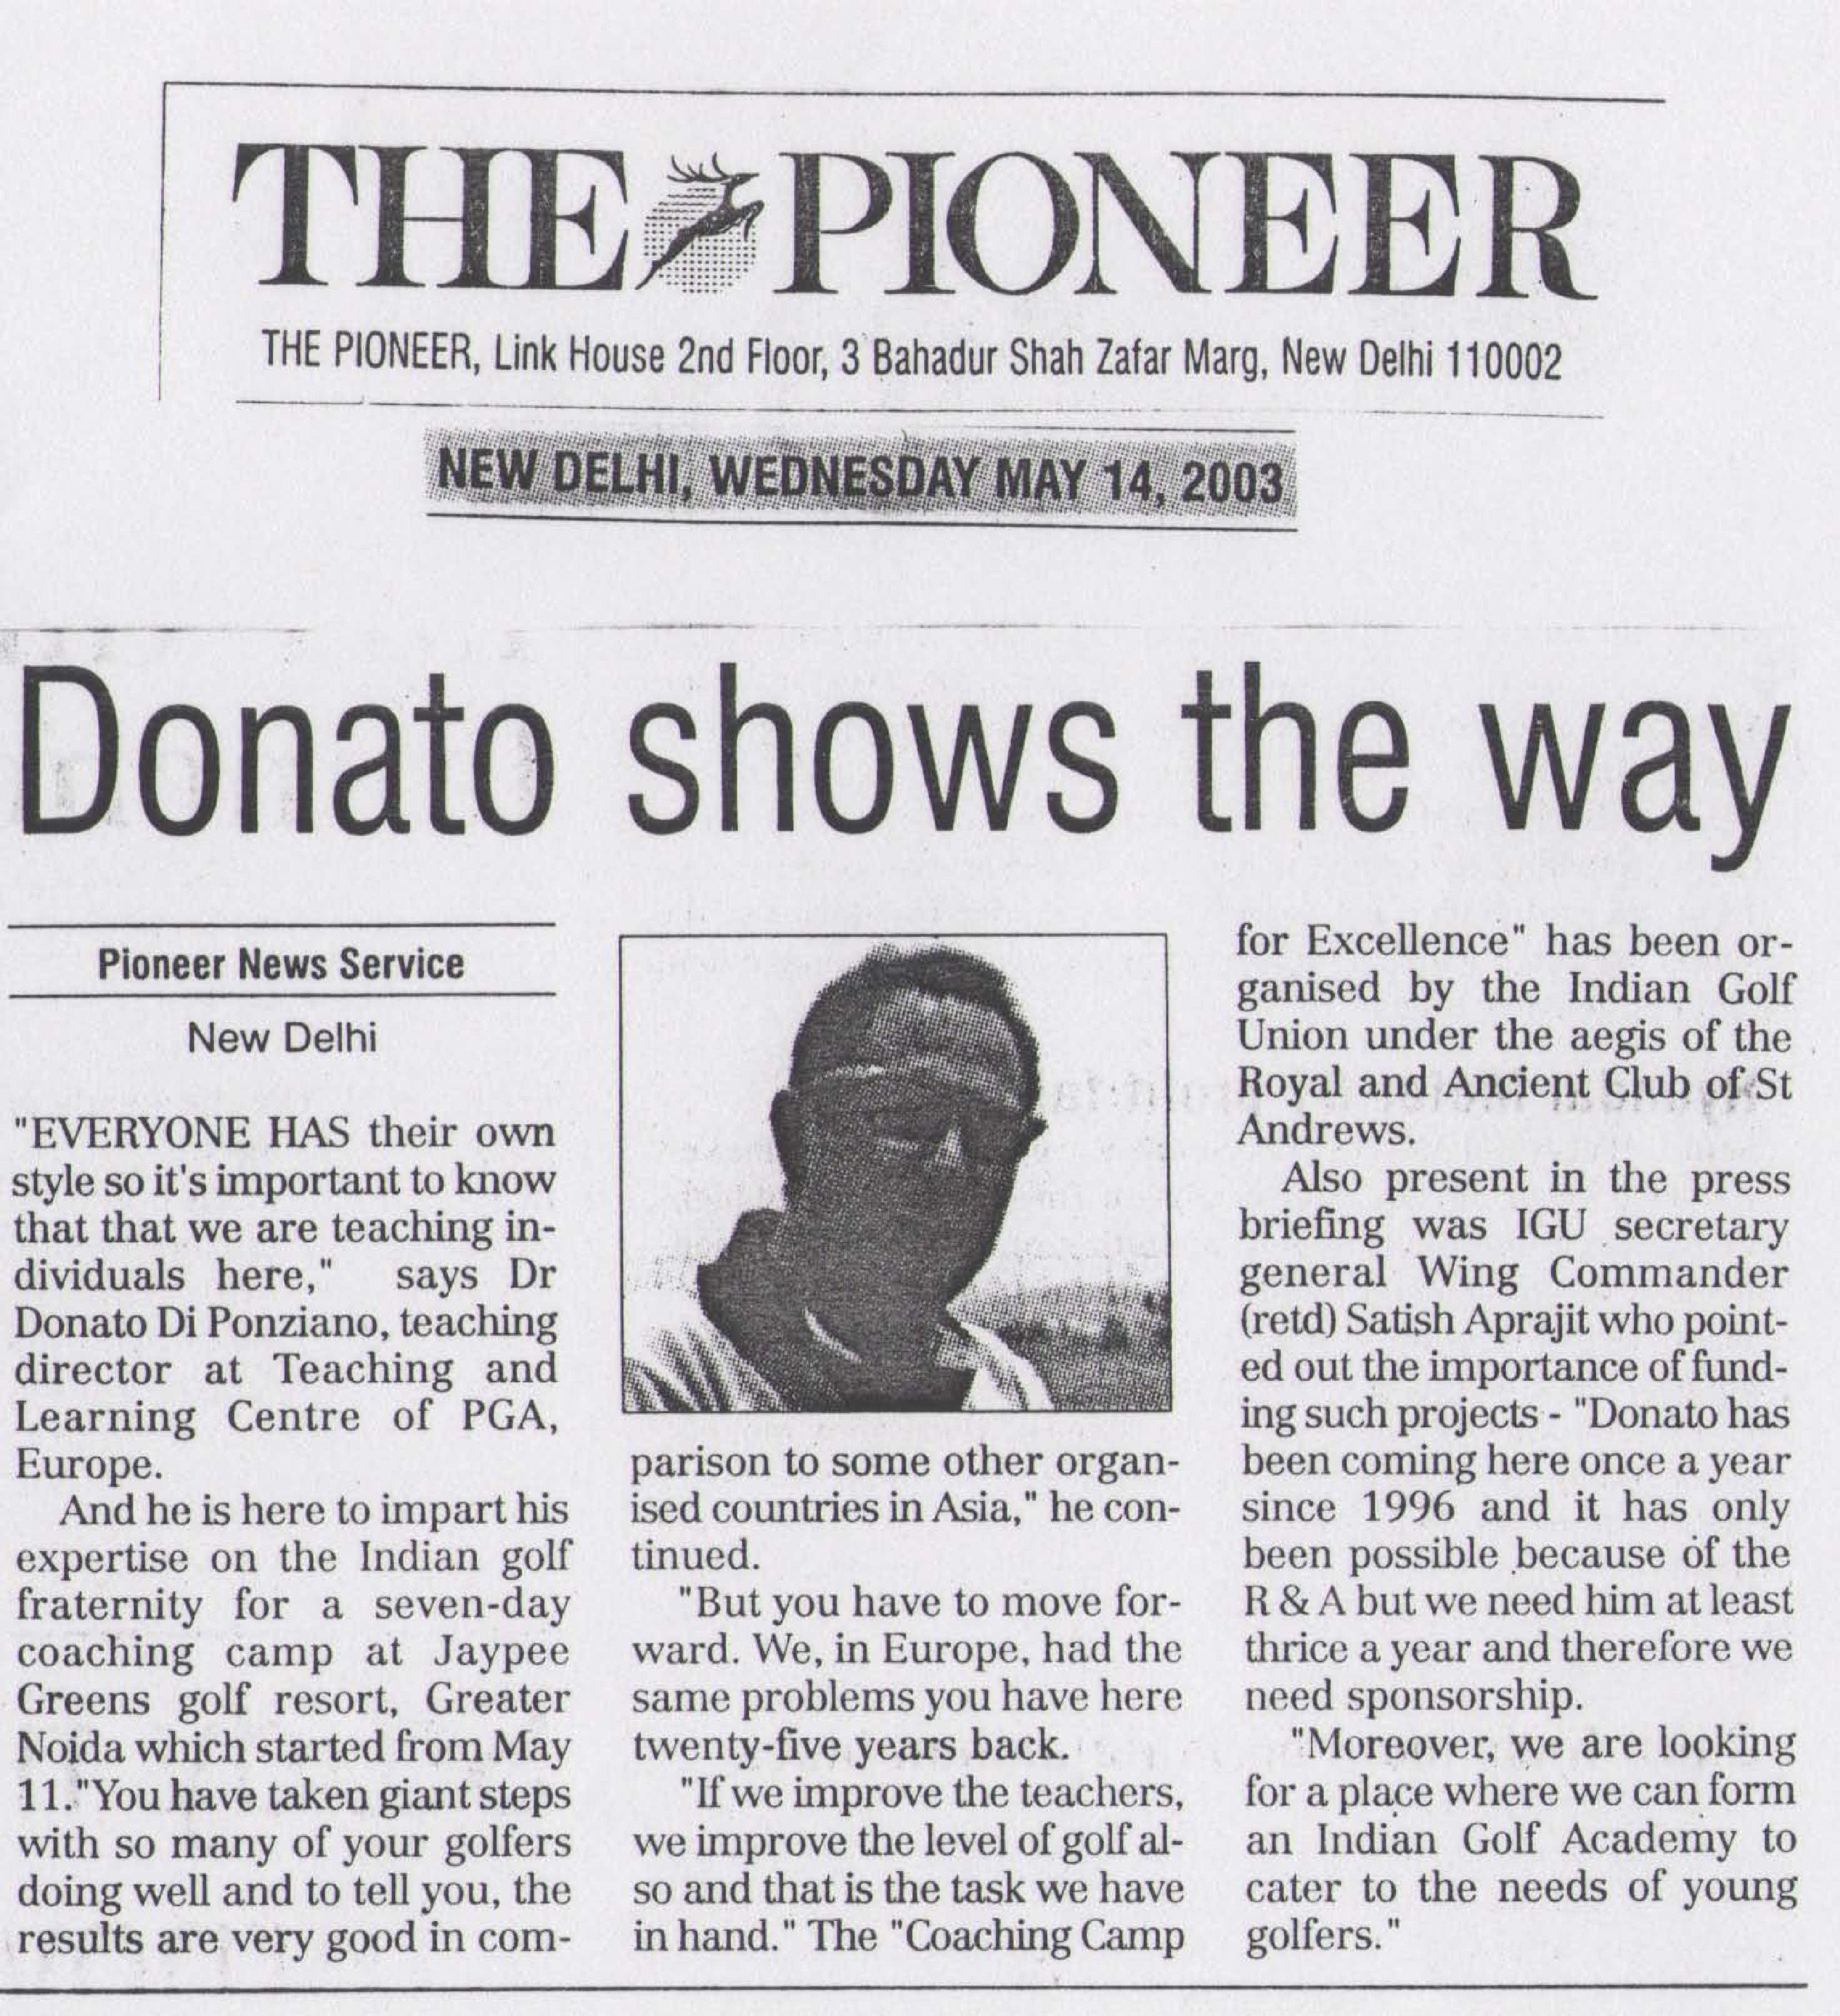 Donato shows the way